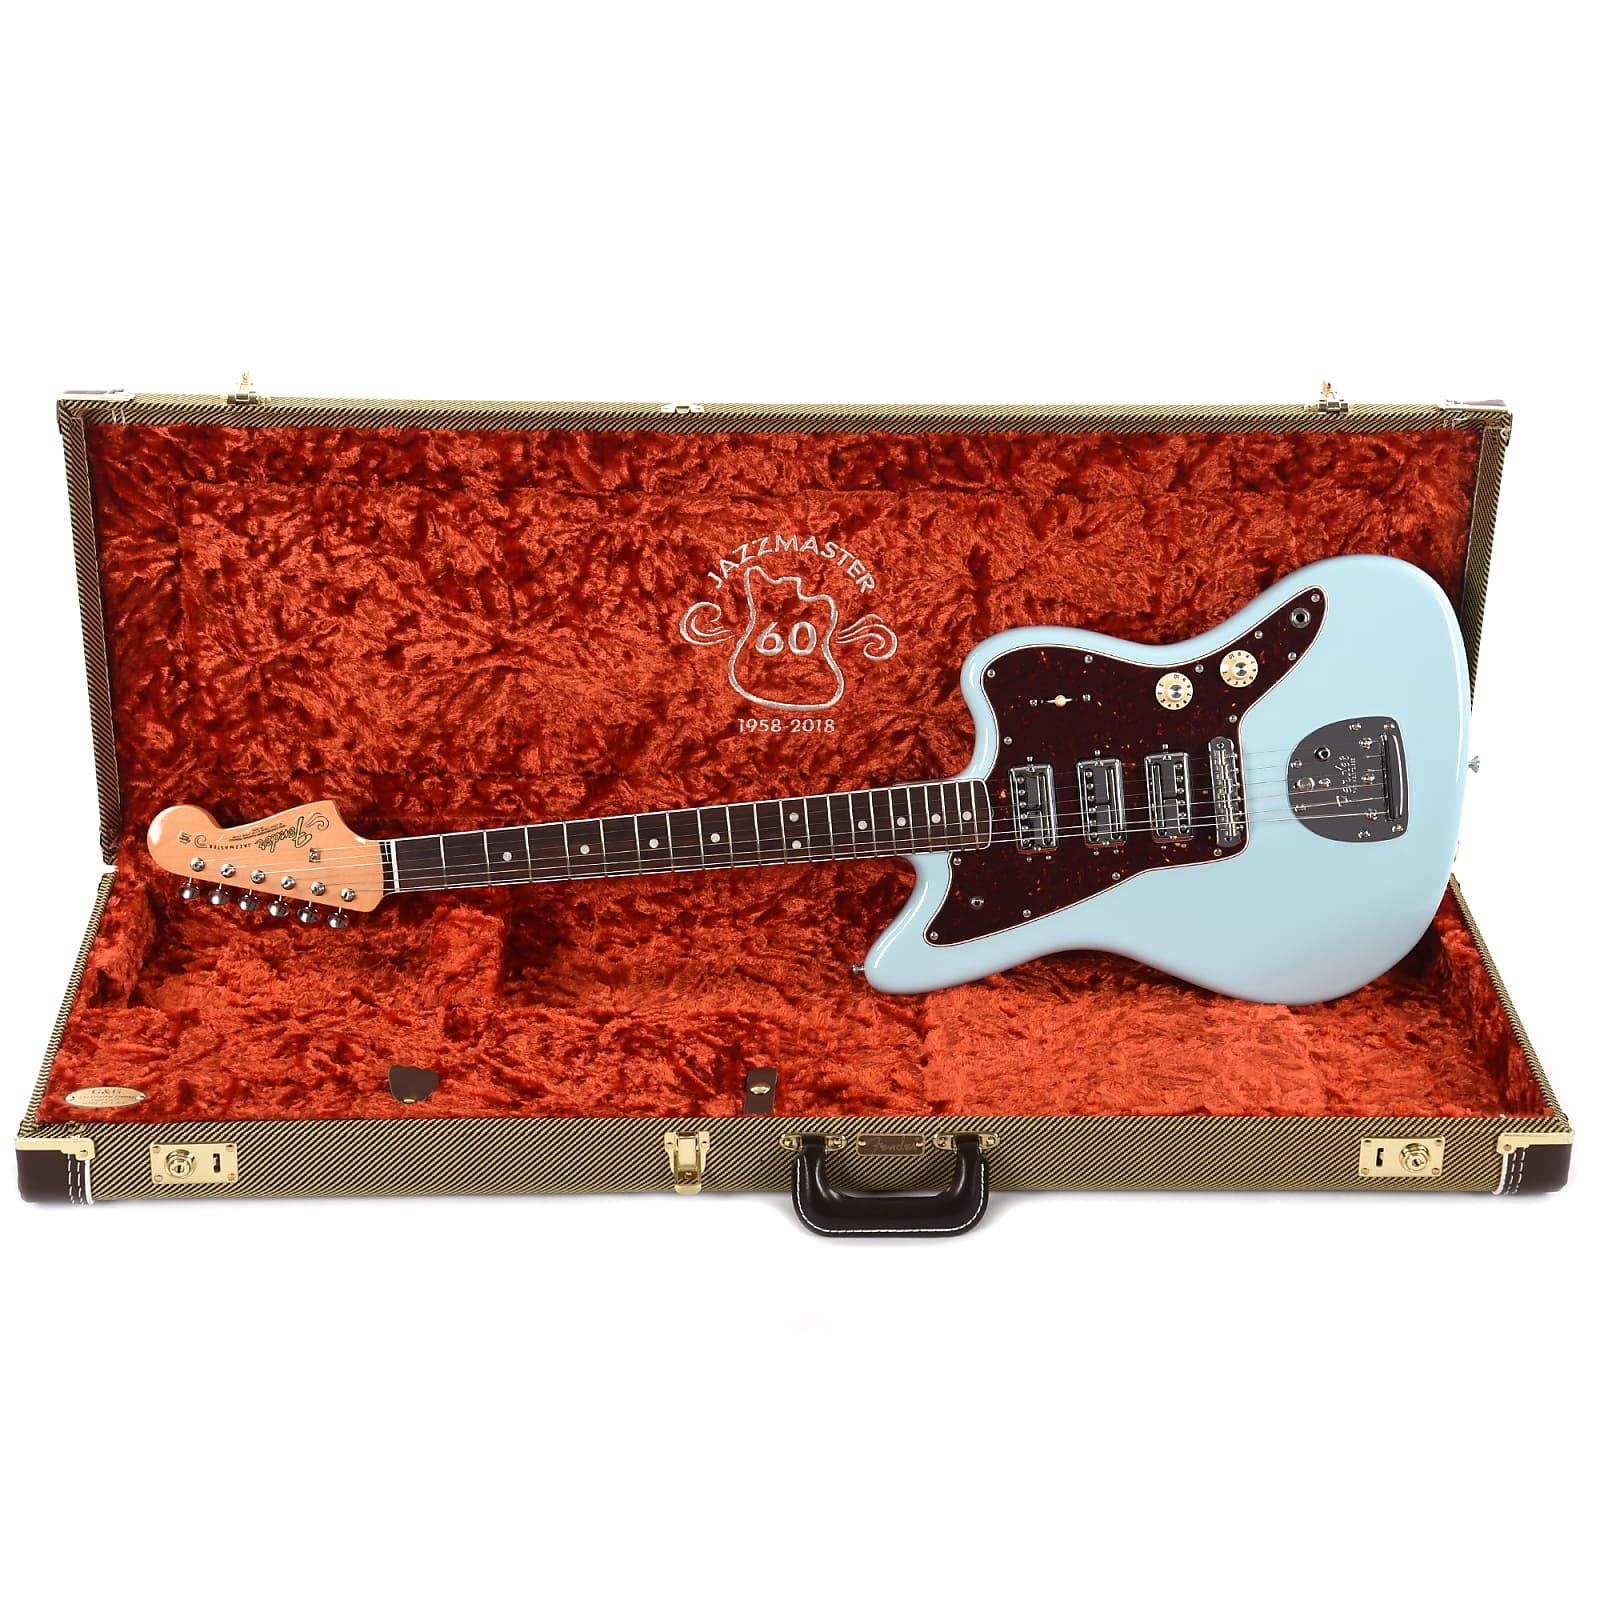 Fender 60th Anniversary Limited Edition Triple Jazzmaster Daphne Blue Wiring Diagram 50 S 199999